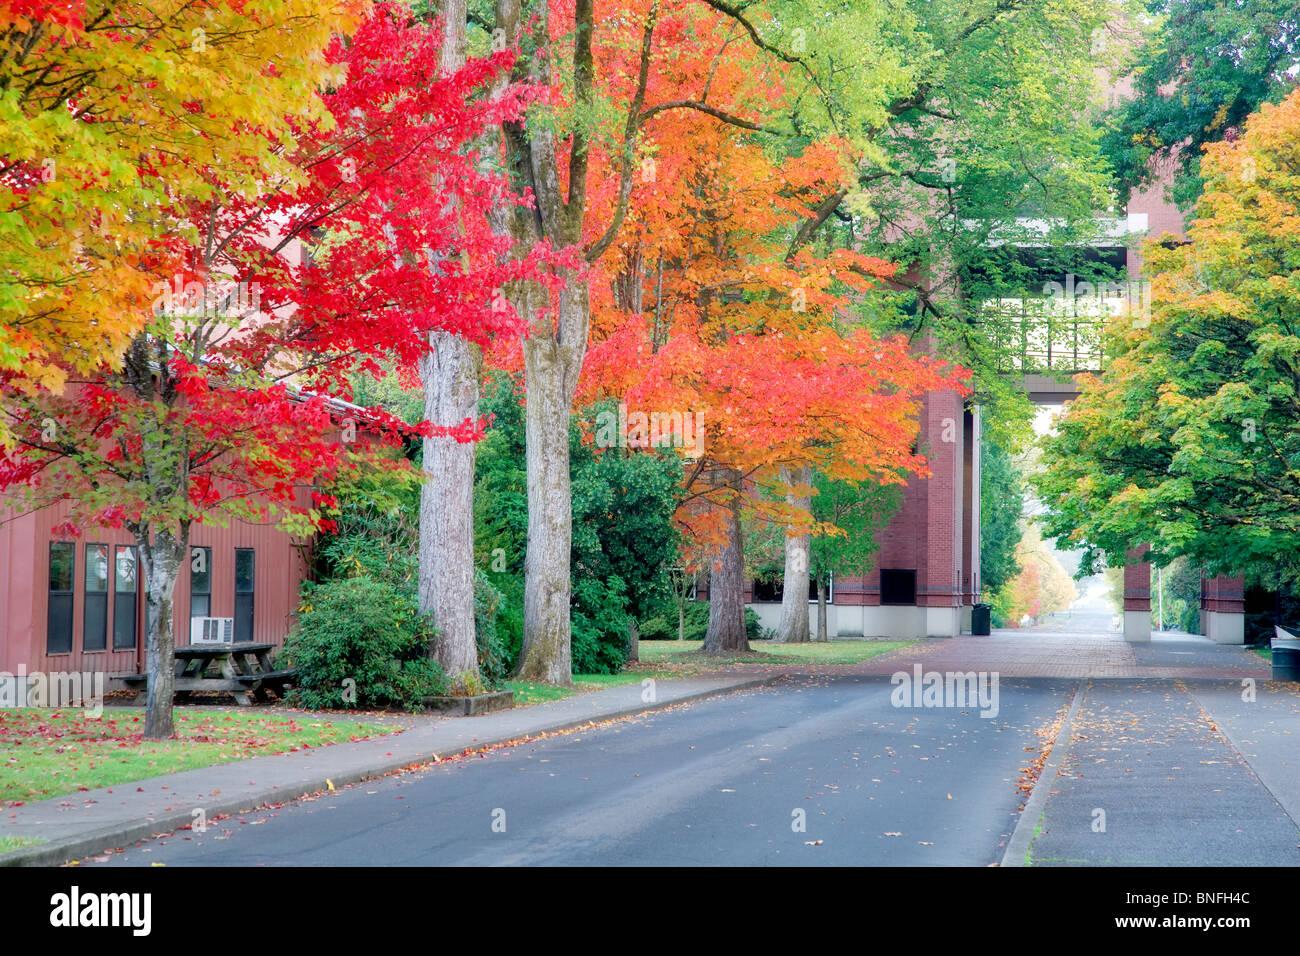 Weg zur Agrar- und Life Sciences mit Fallfarbe. Oregon State University. Stockbild